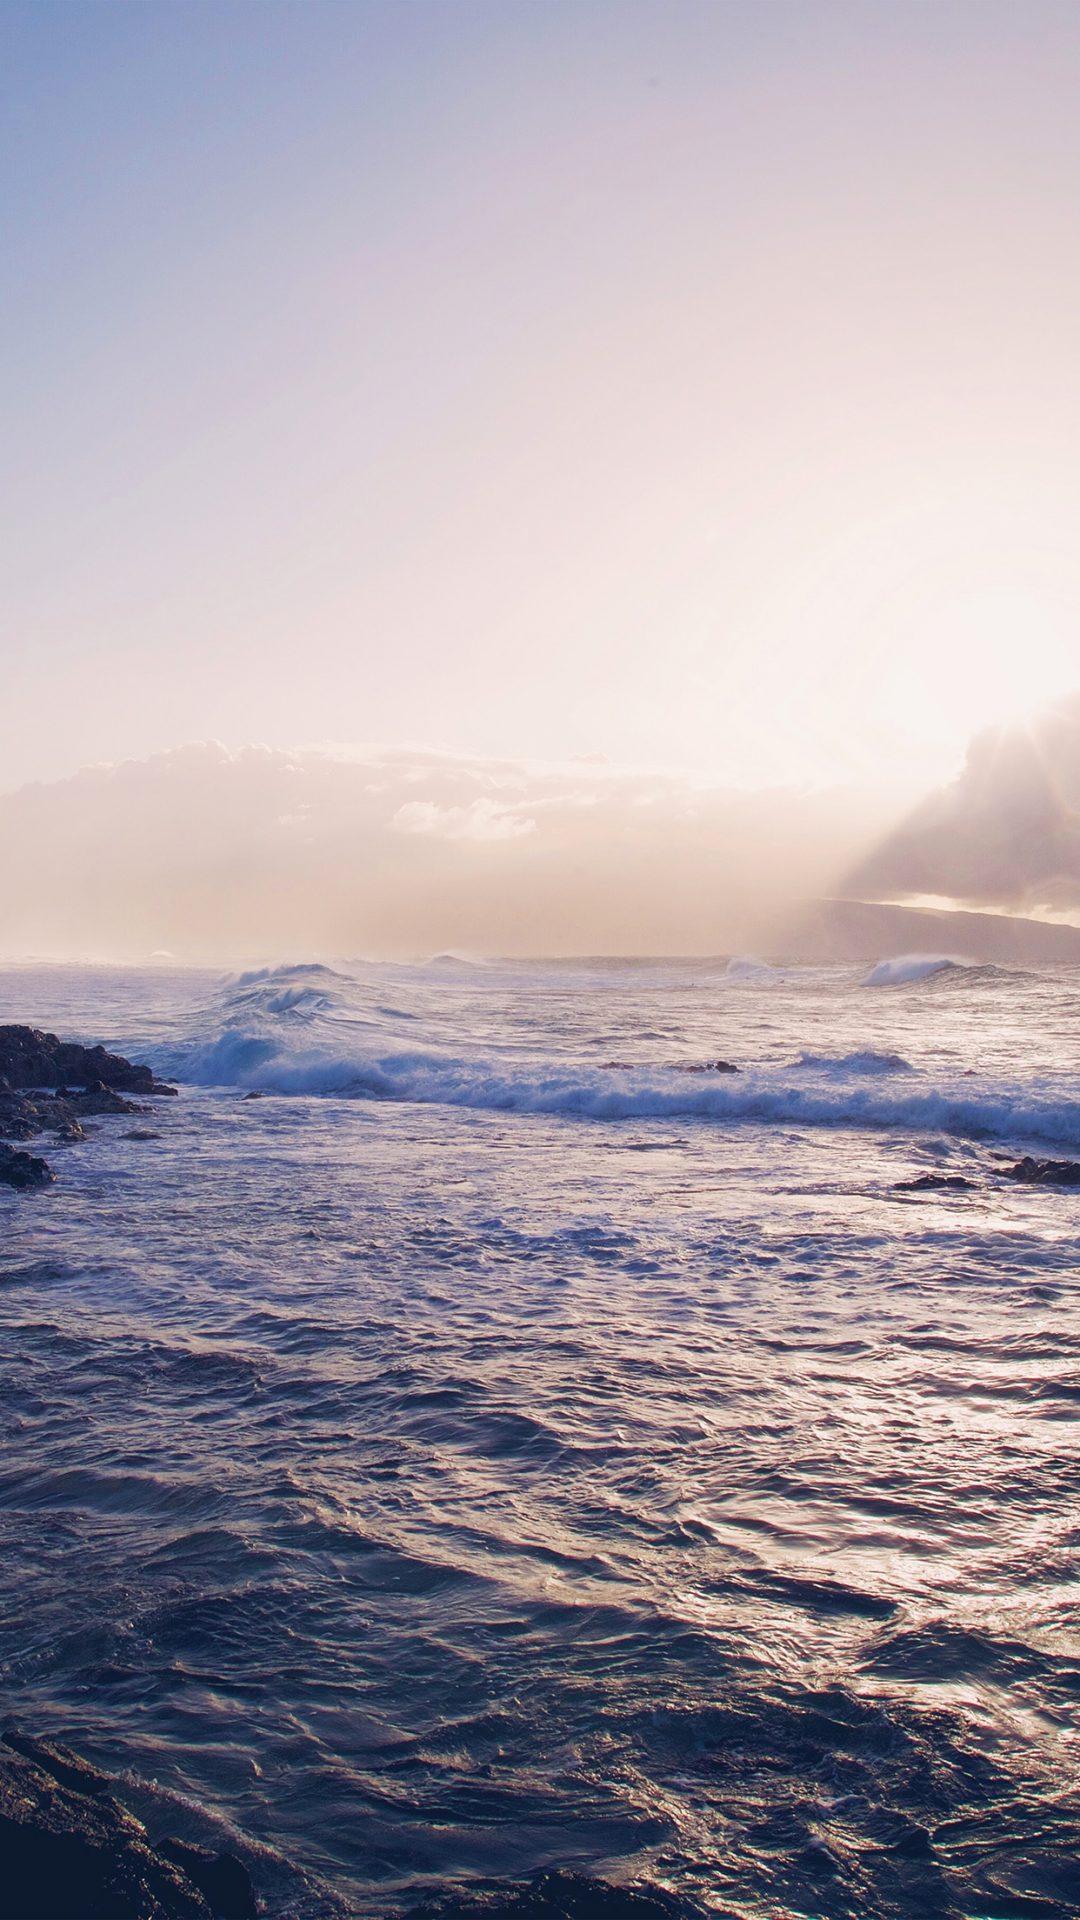 Sea Ocean Rock Nature Wave Sky